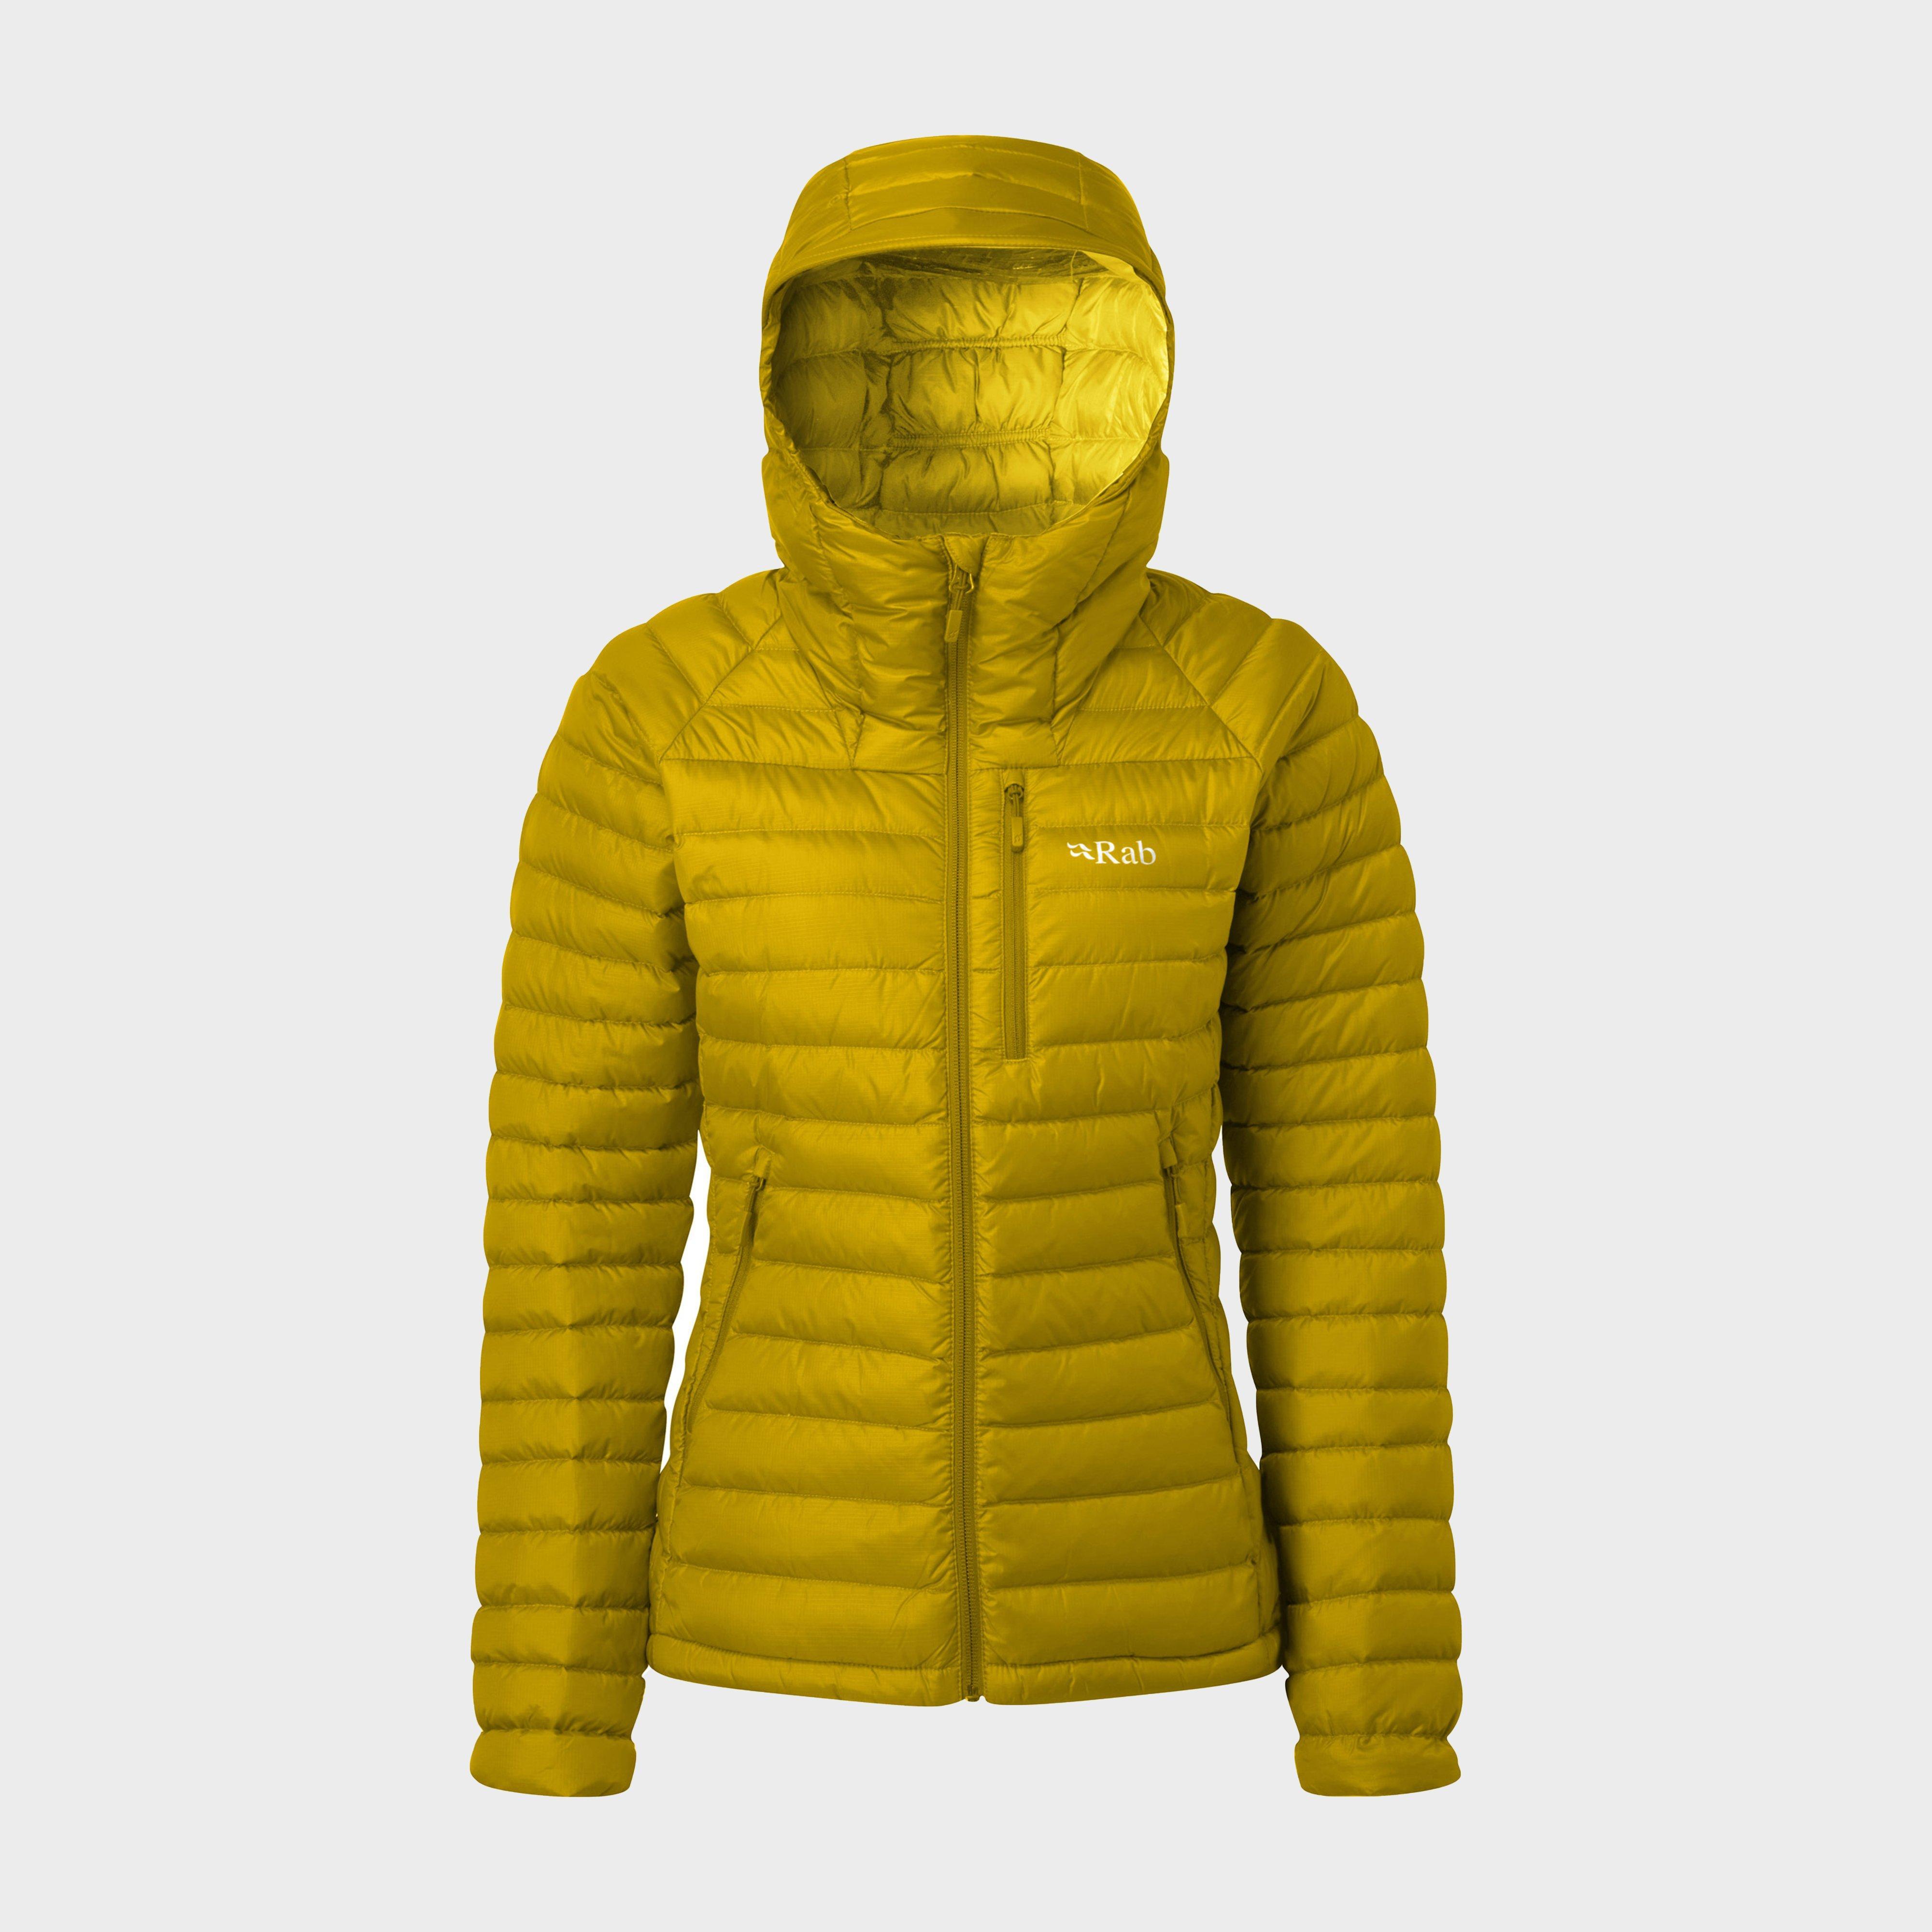 Rab Rab Womens Microlight Alpine Down Jacket - N/A, N/A